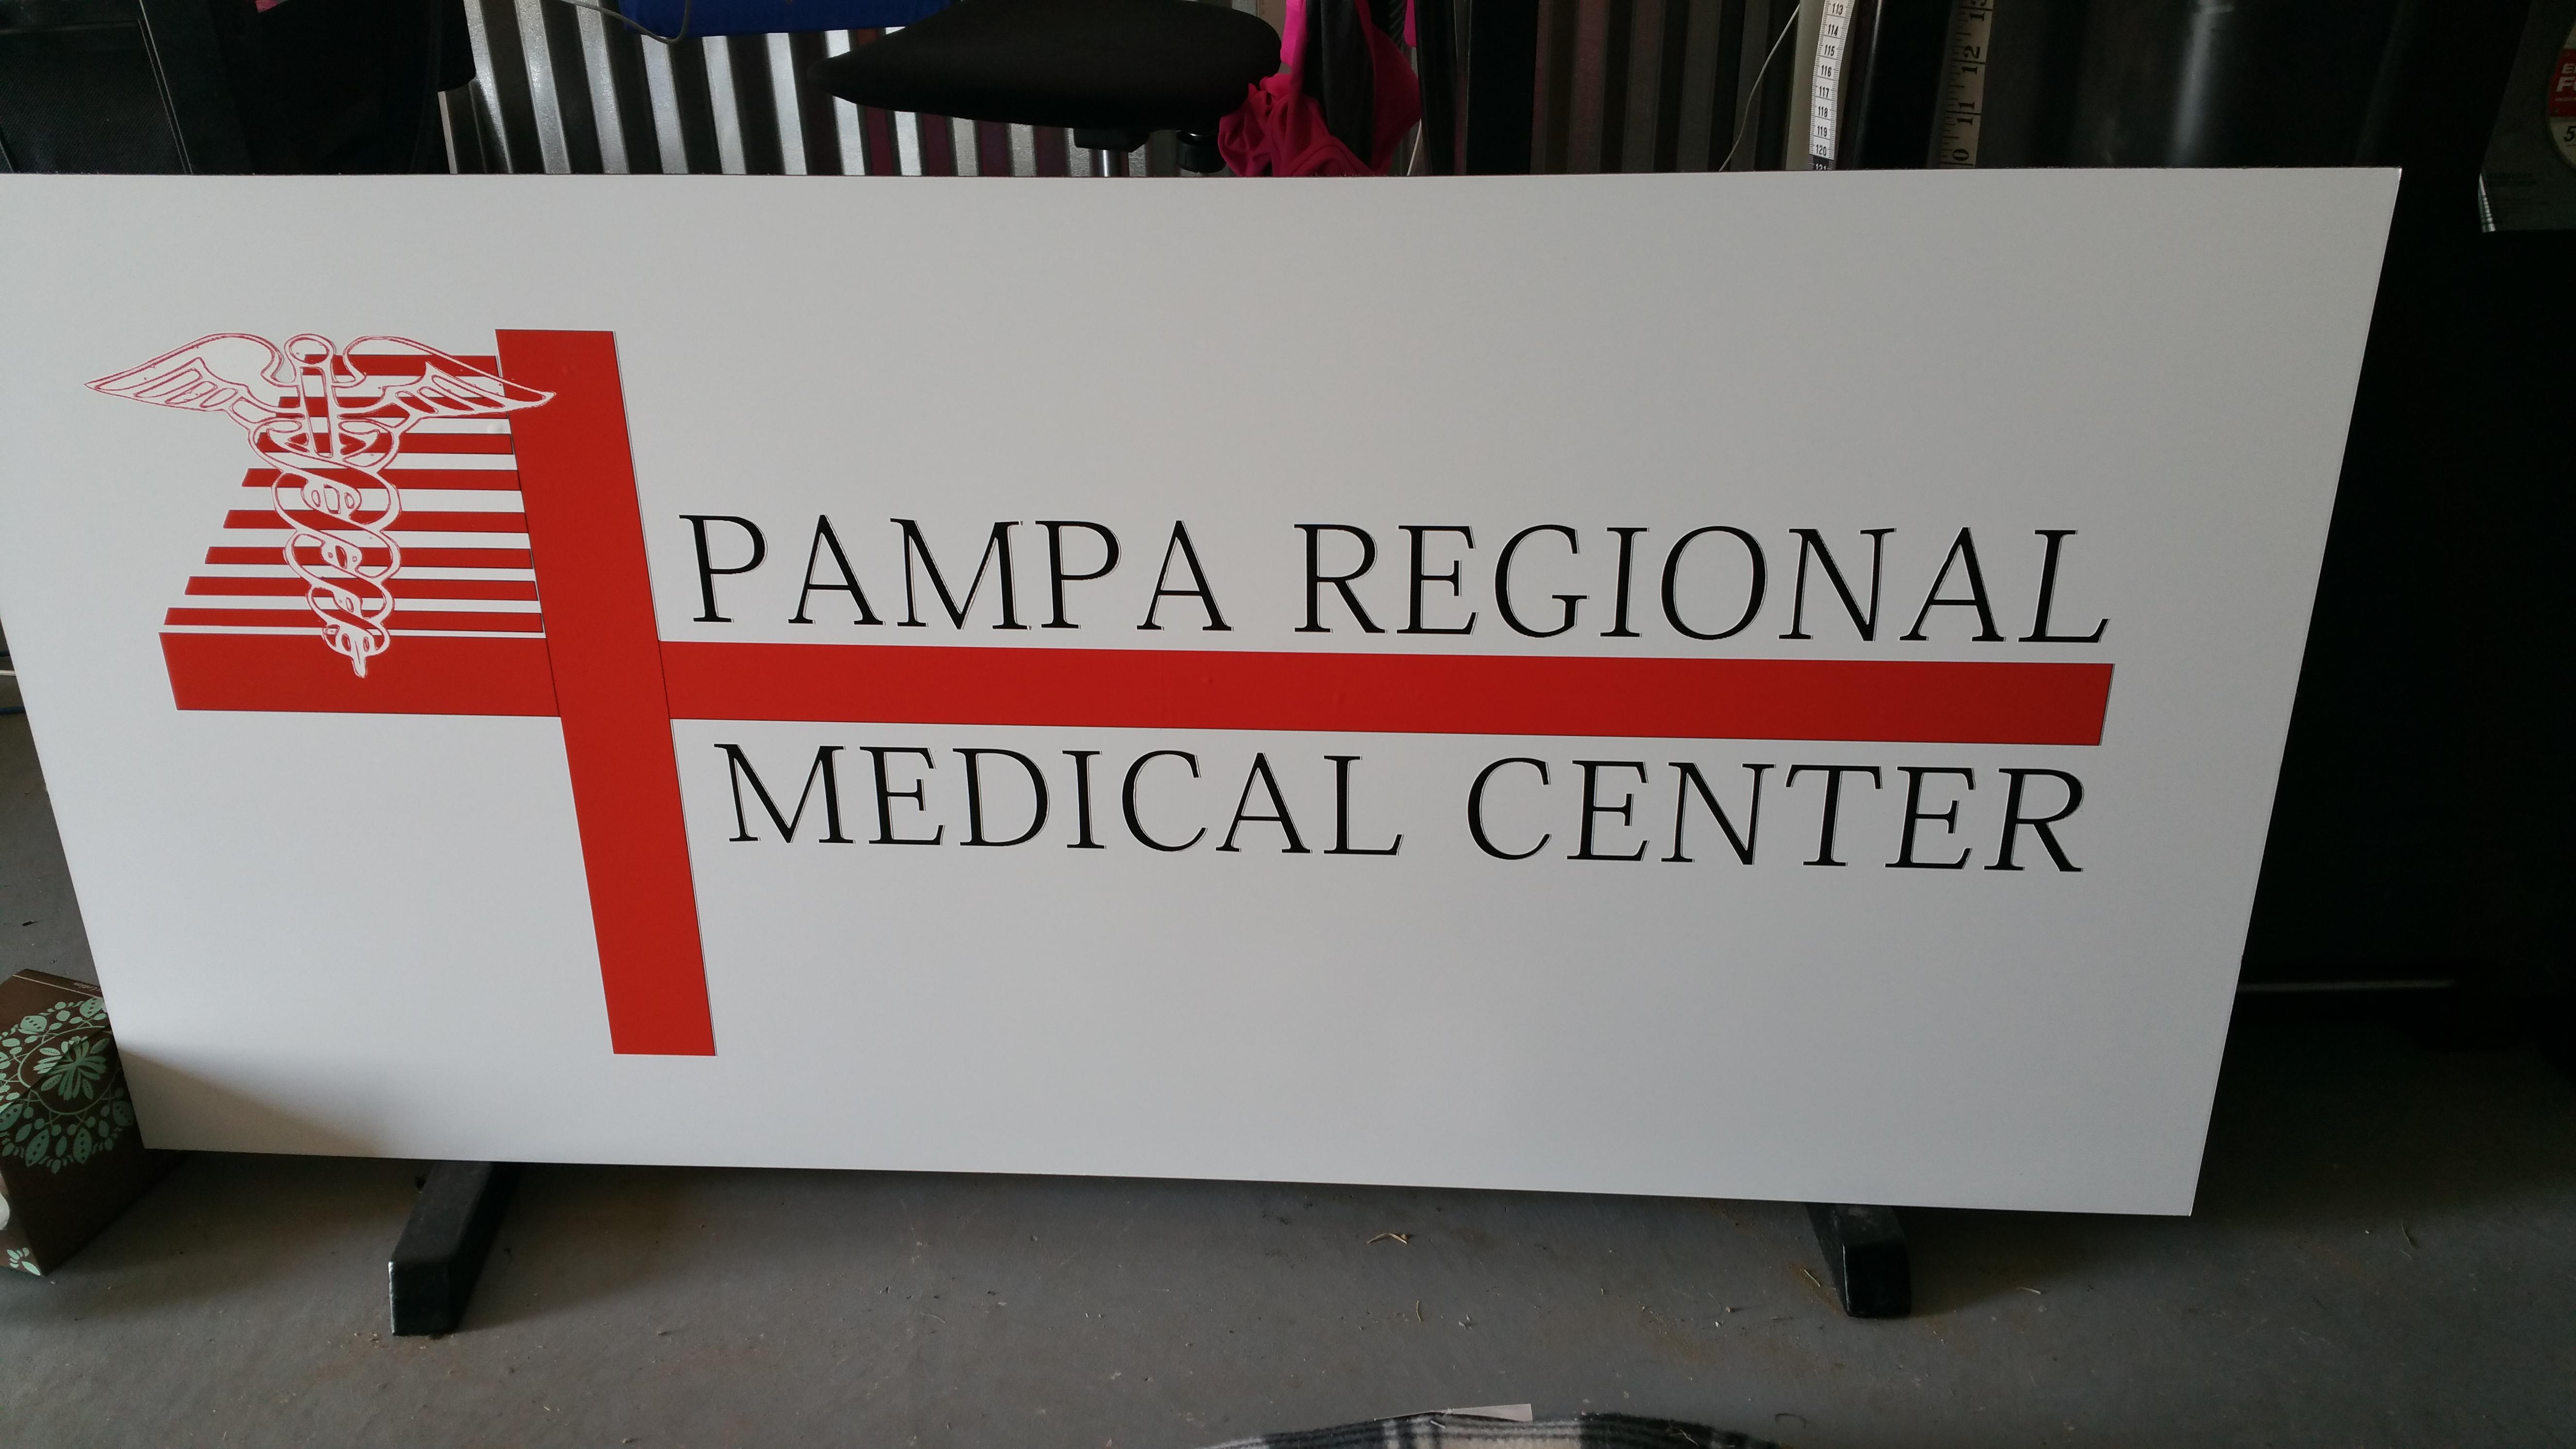 pampa regional